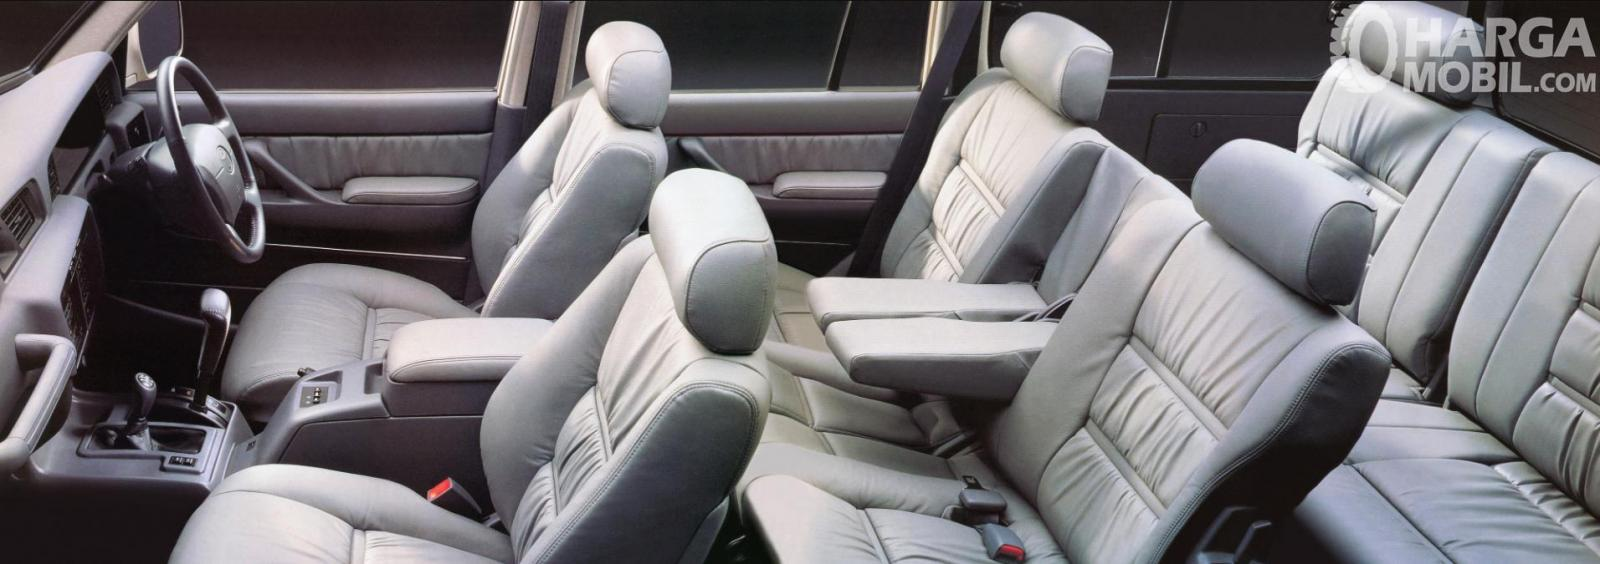 Foto Kabin Toyota Land Cruiser 80 Series luas dan lapang